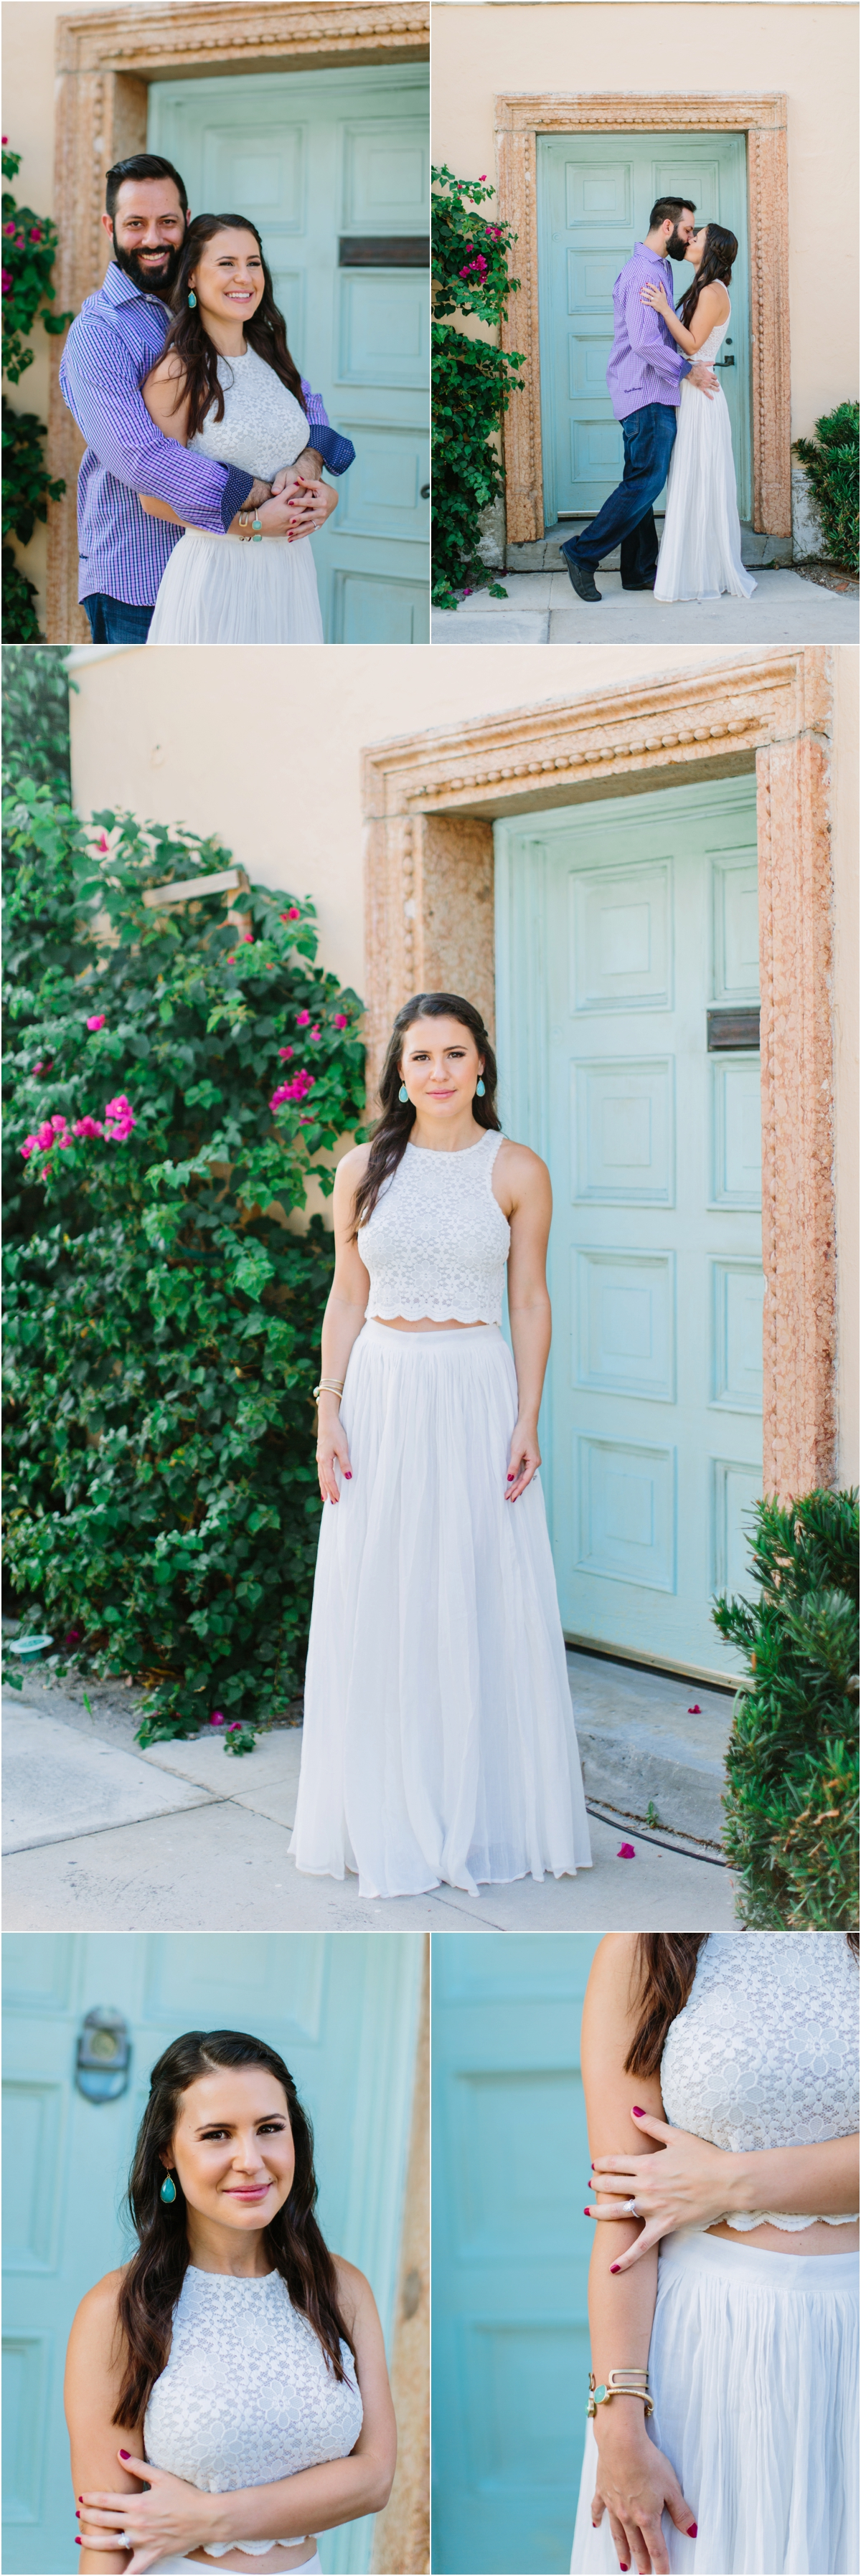 Palm-Beach-Engagement-Wedding-Photos_0004